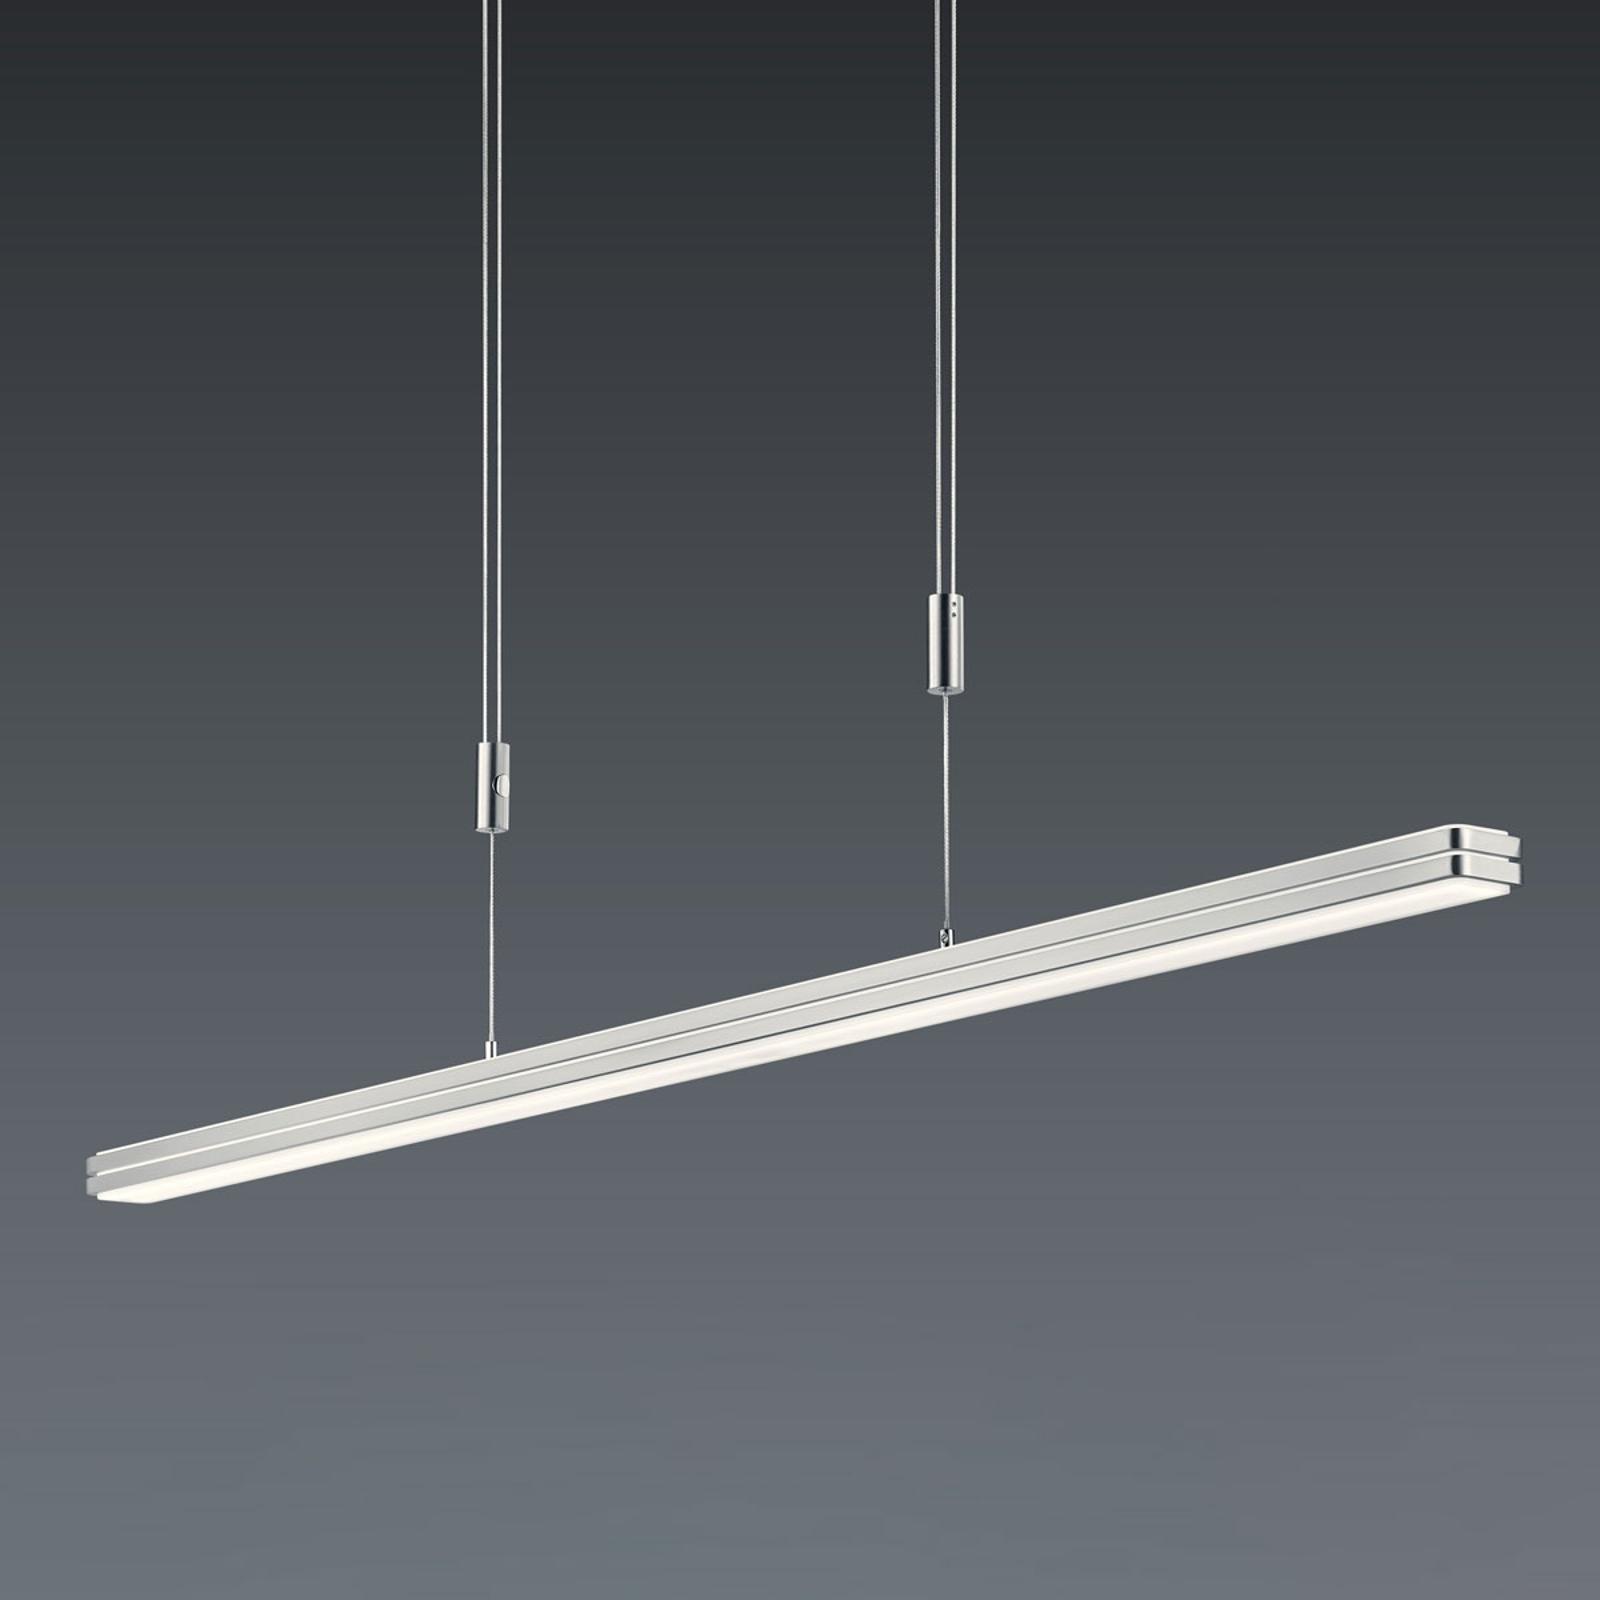 BANKAMP Gem LED-Pendelleuchte, ZigBee-kompatibel